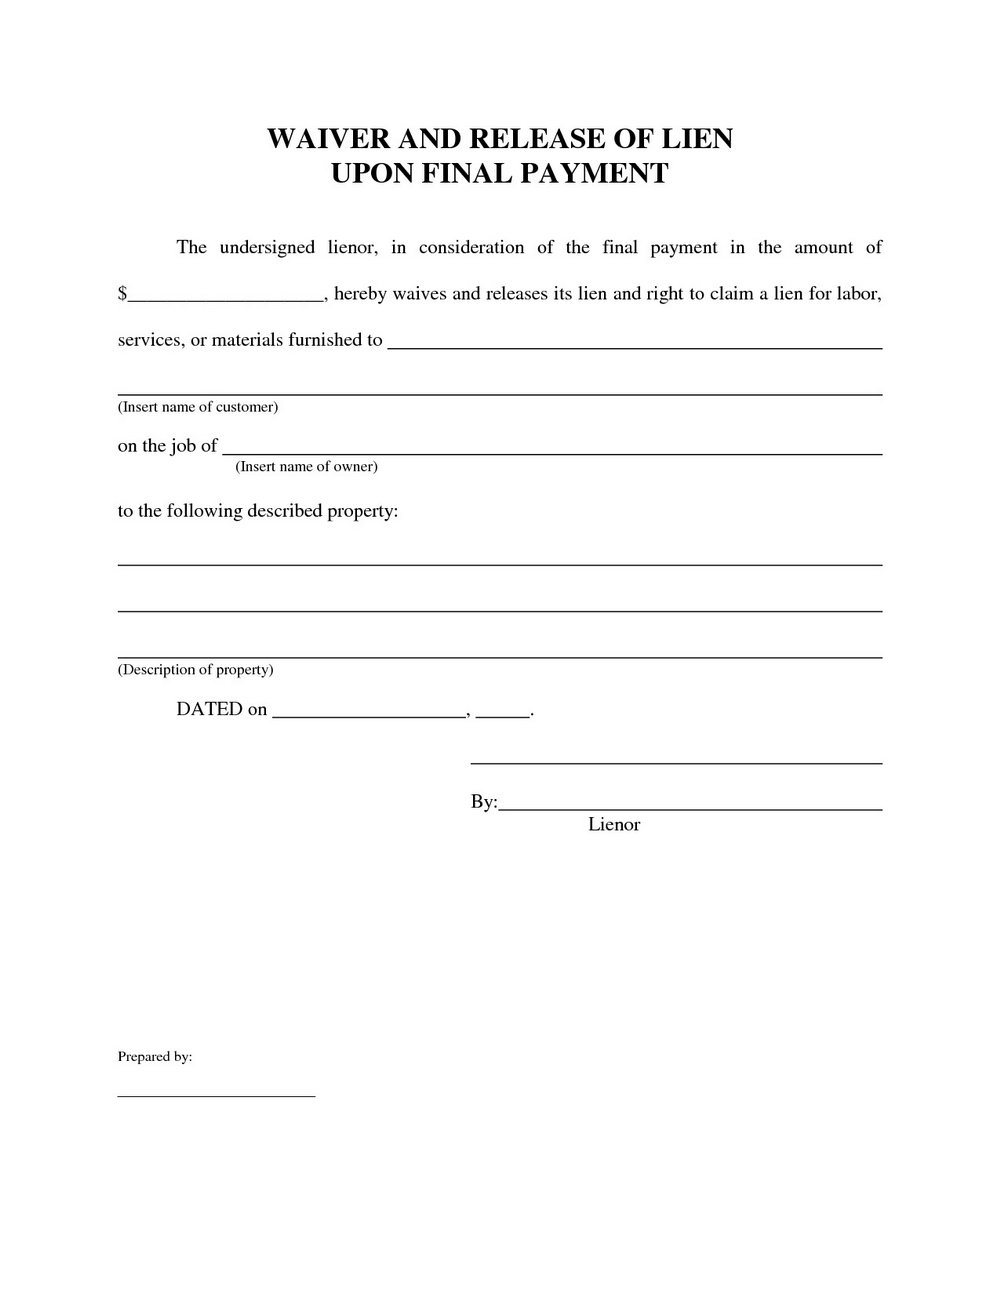 Lien Release Form Florida